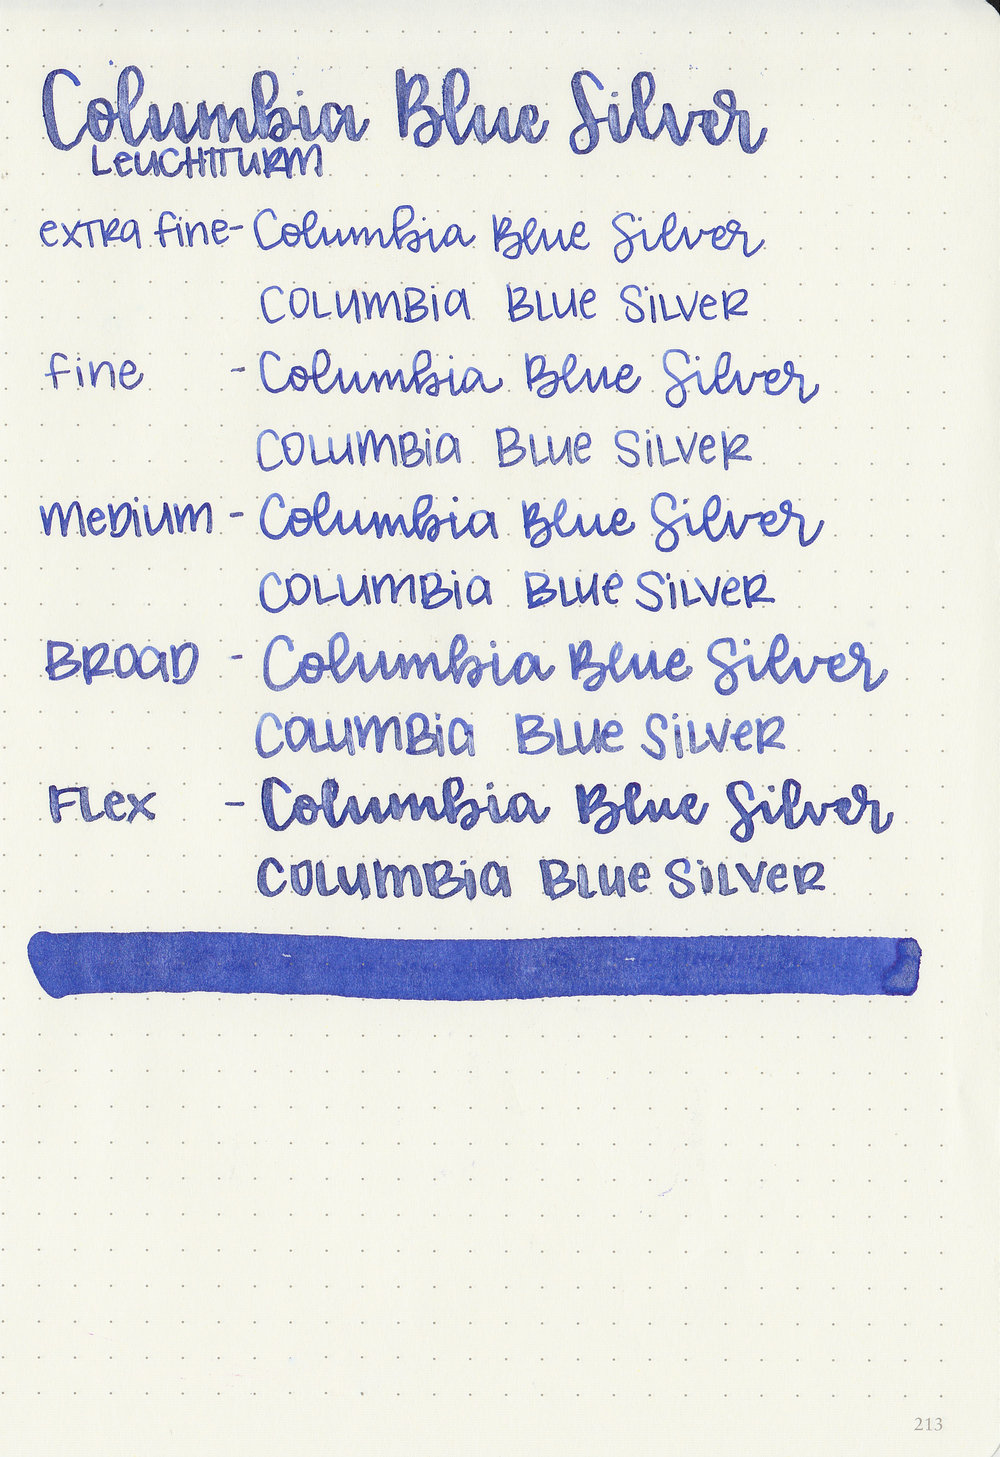 da-columbia-blue-12.jpg